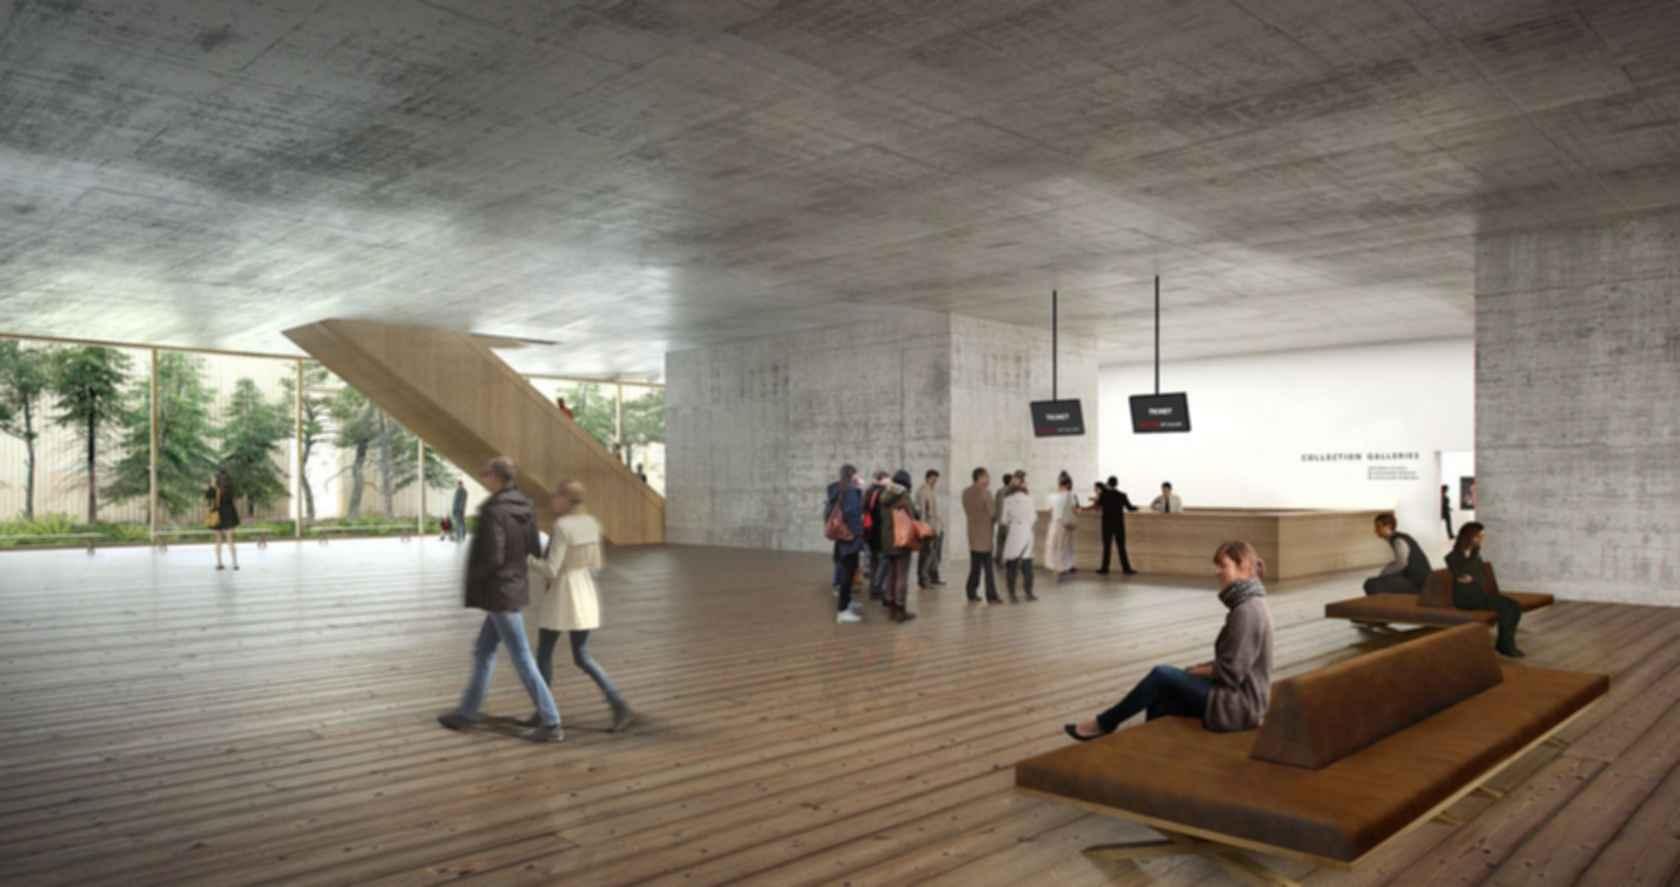 Vancouver Art Gallery - concept design interior entrance